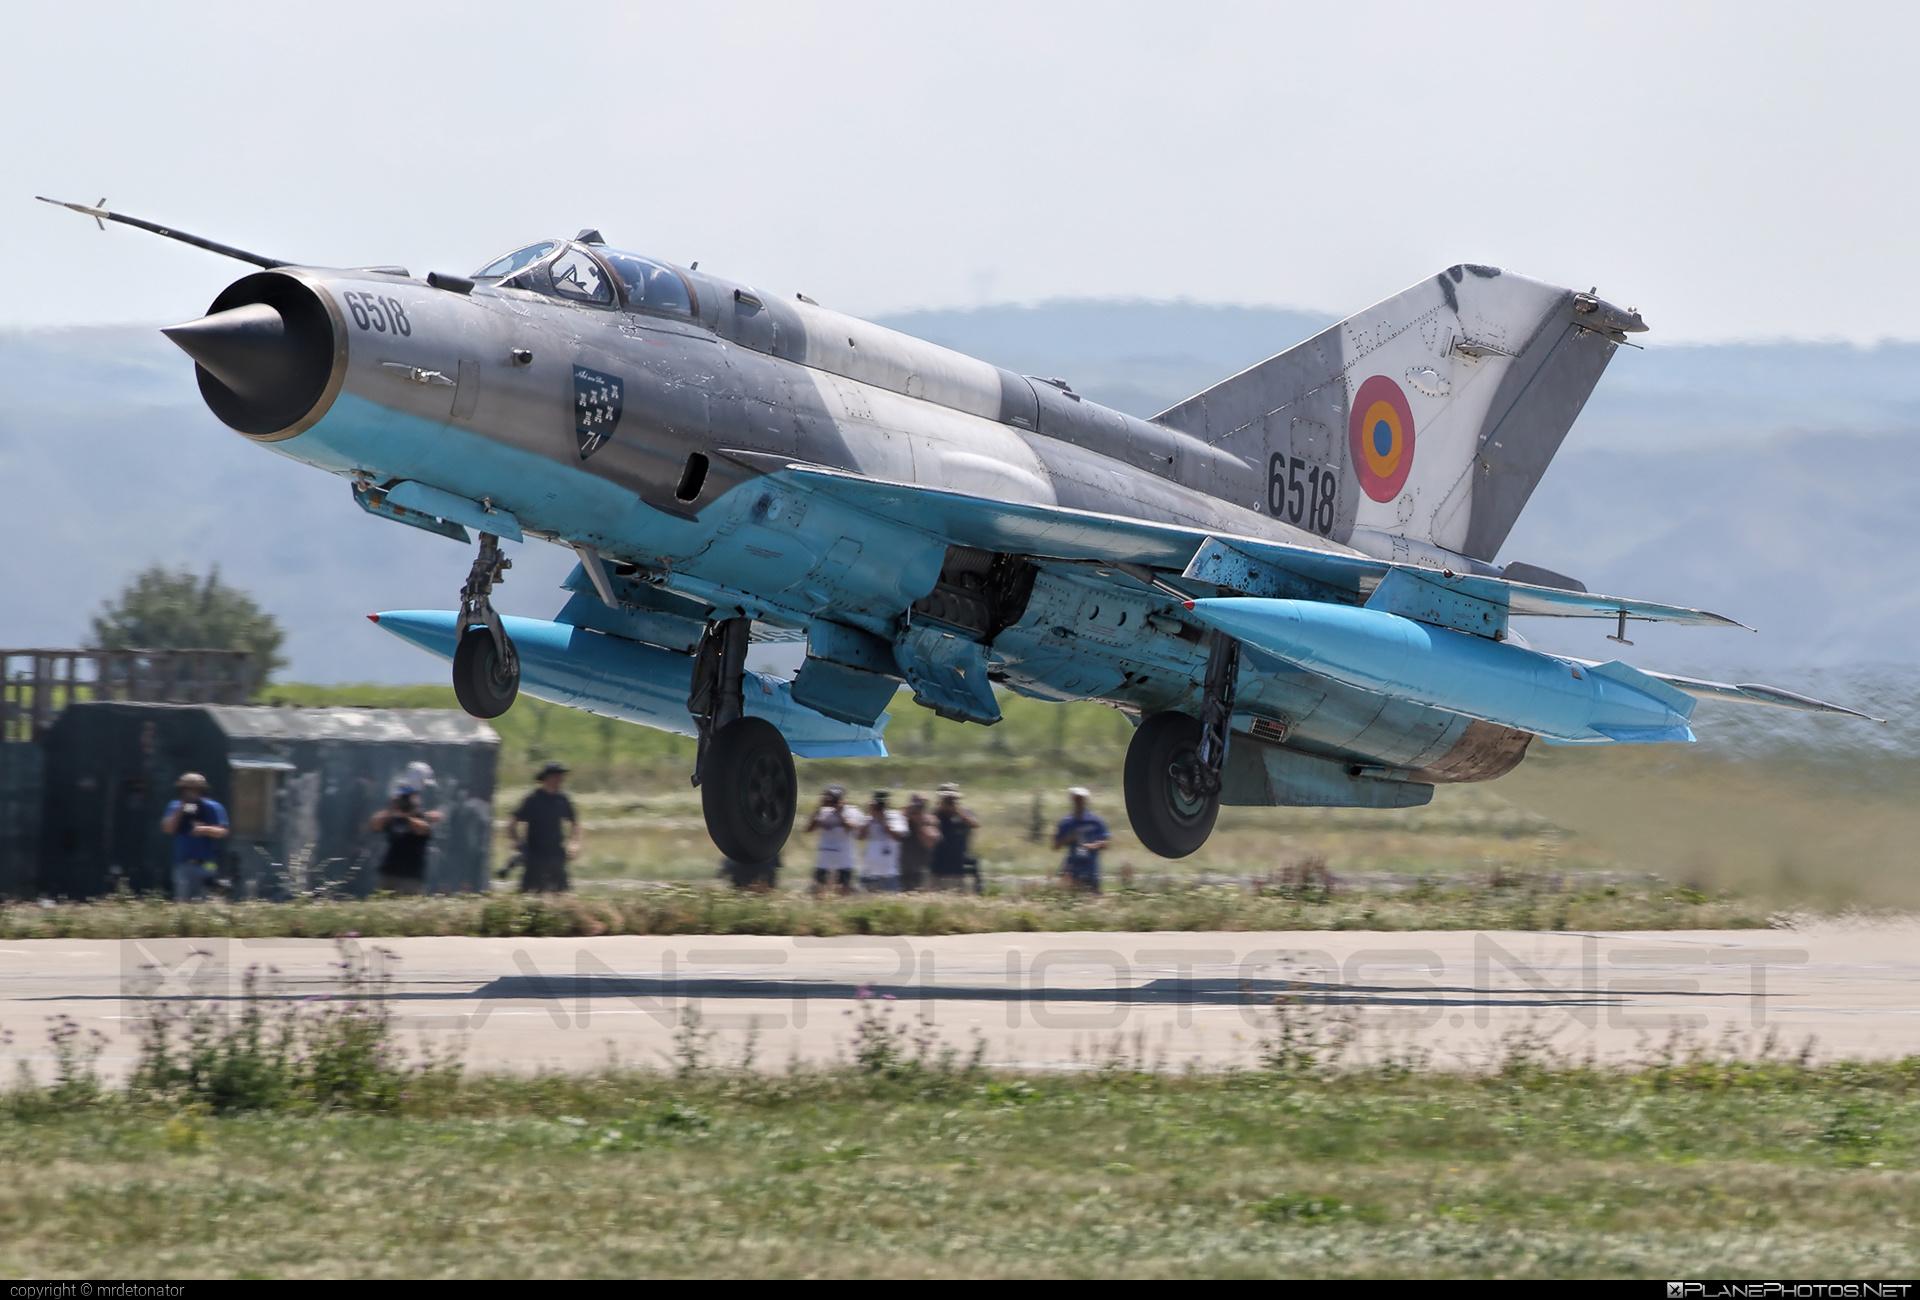 Mikoyan-Gurevich MiG-21MF - 6518 operated by Forţele Aeriene Române (Romanian Air Force) #forteleaerieneromane #mig #mig21 #mig21mf #mikoyangurevich #romanianairforce